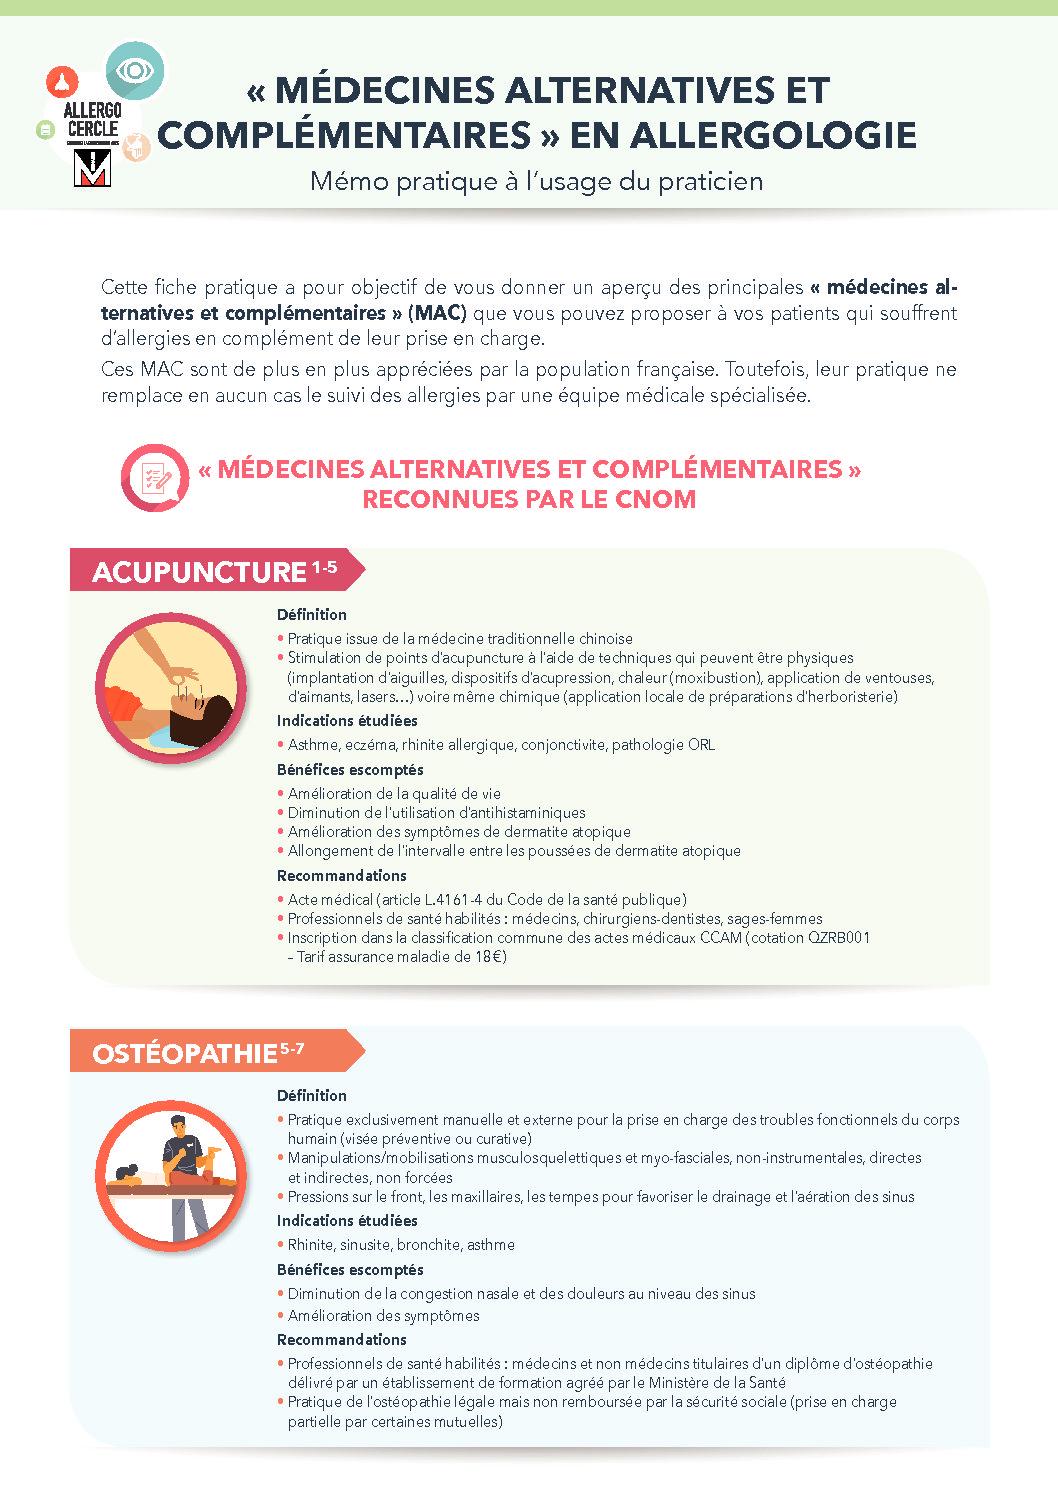 medecines alternatives et complementaires